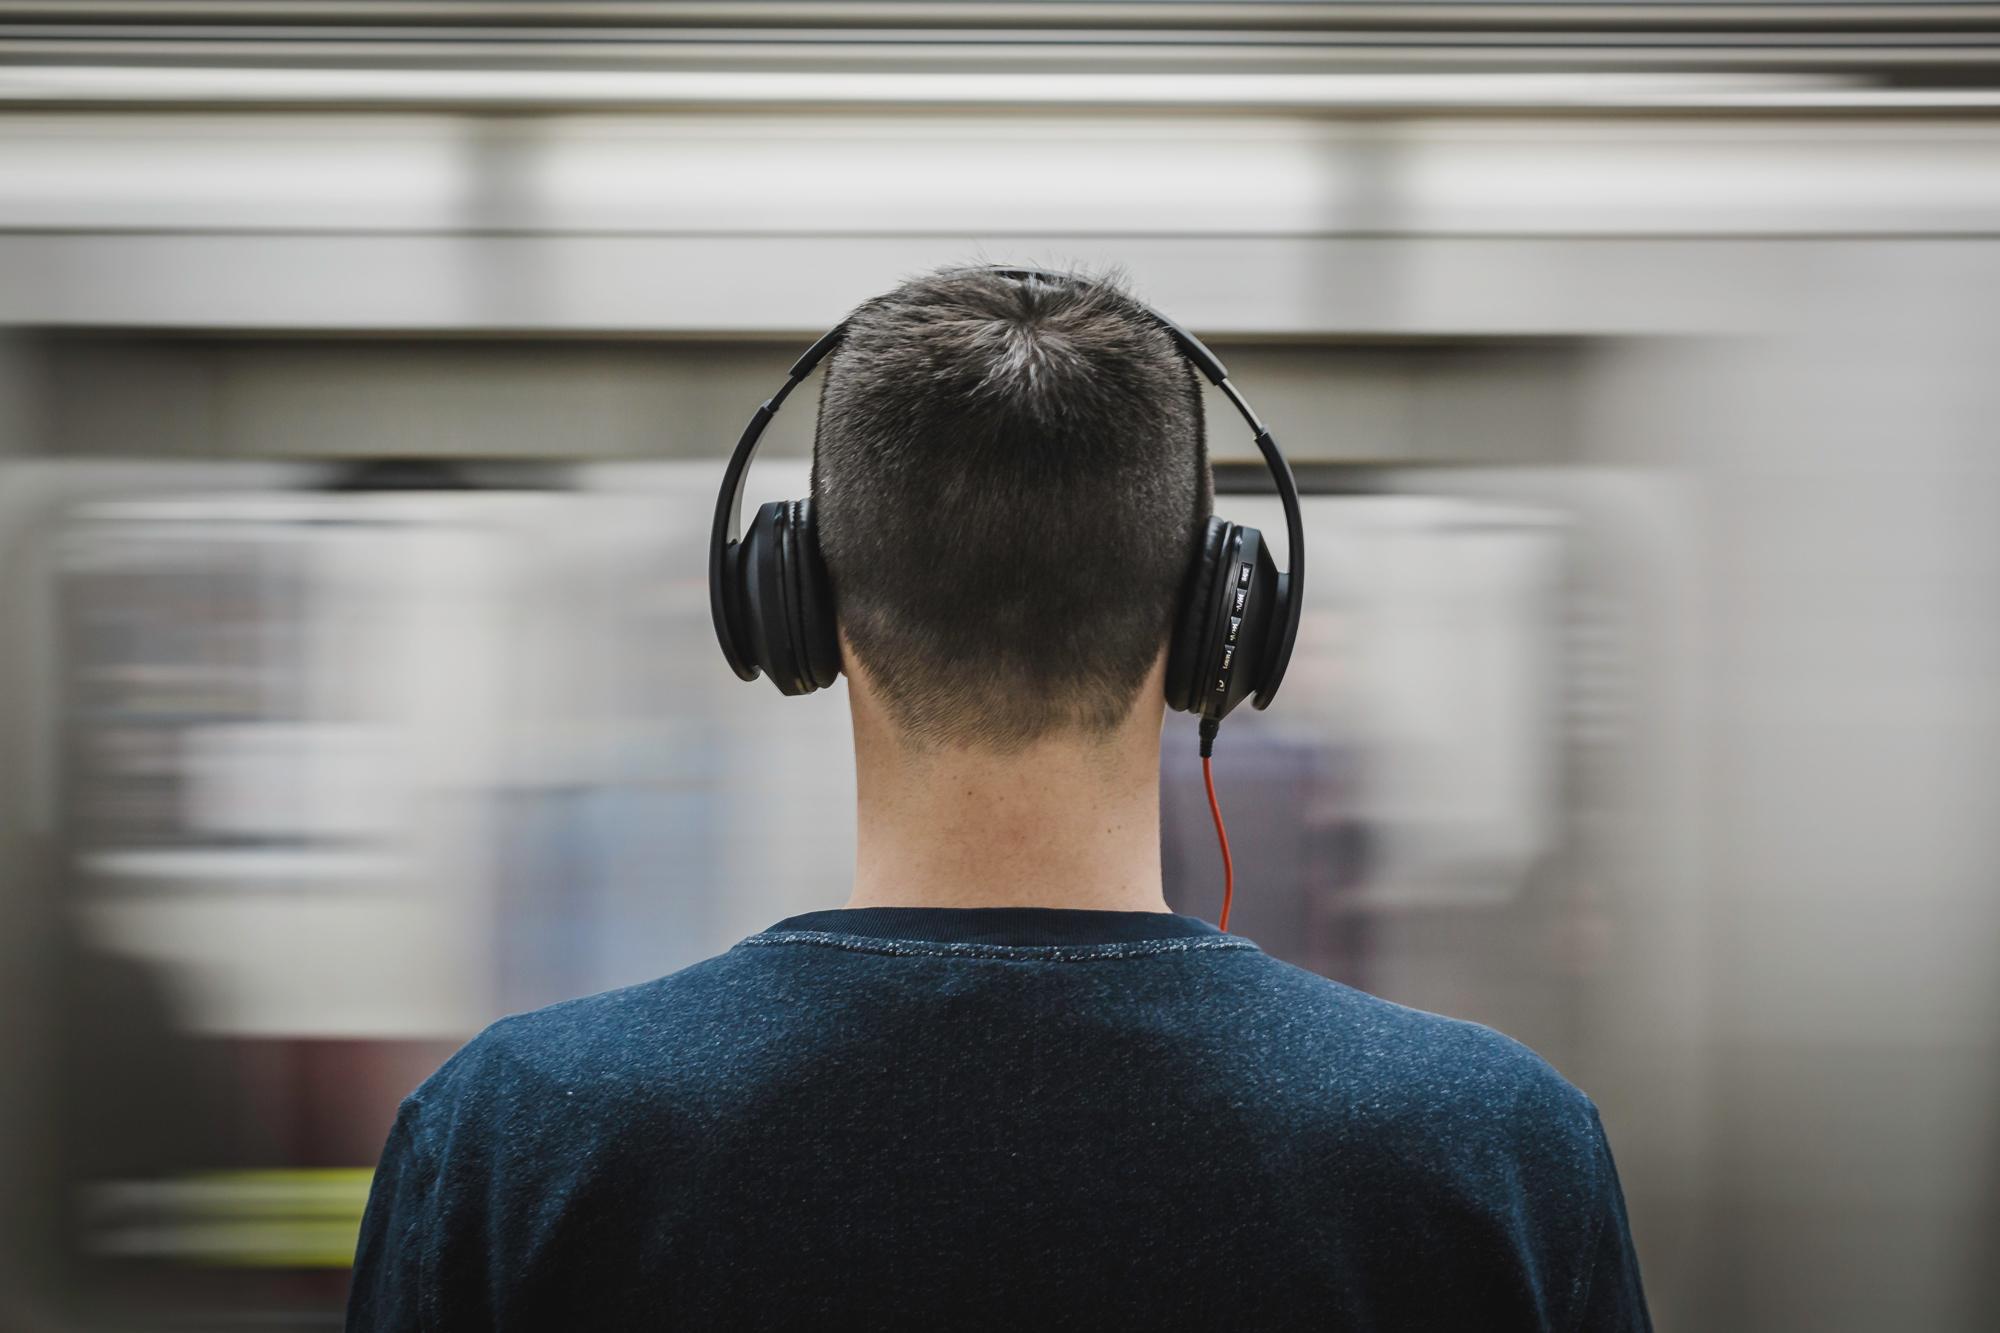 Best noise cancelling headphones under $100 - SoundGuys